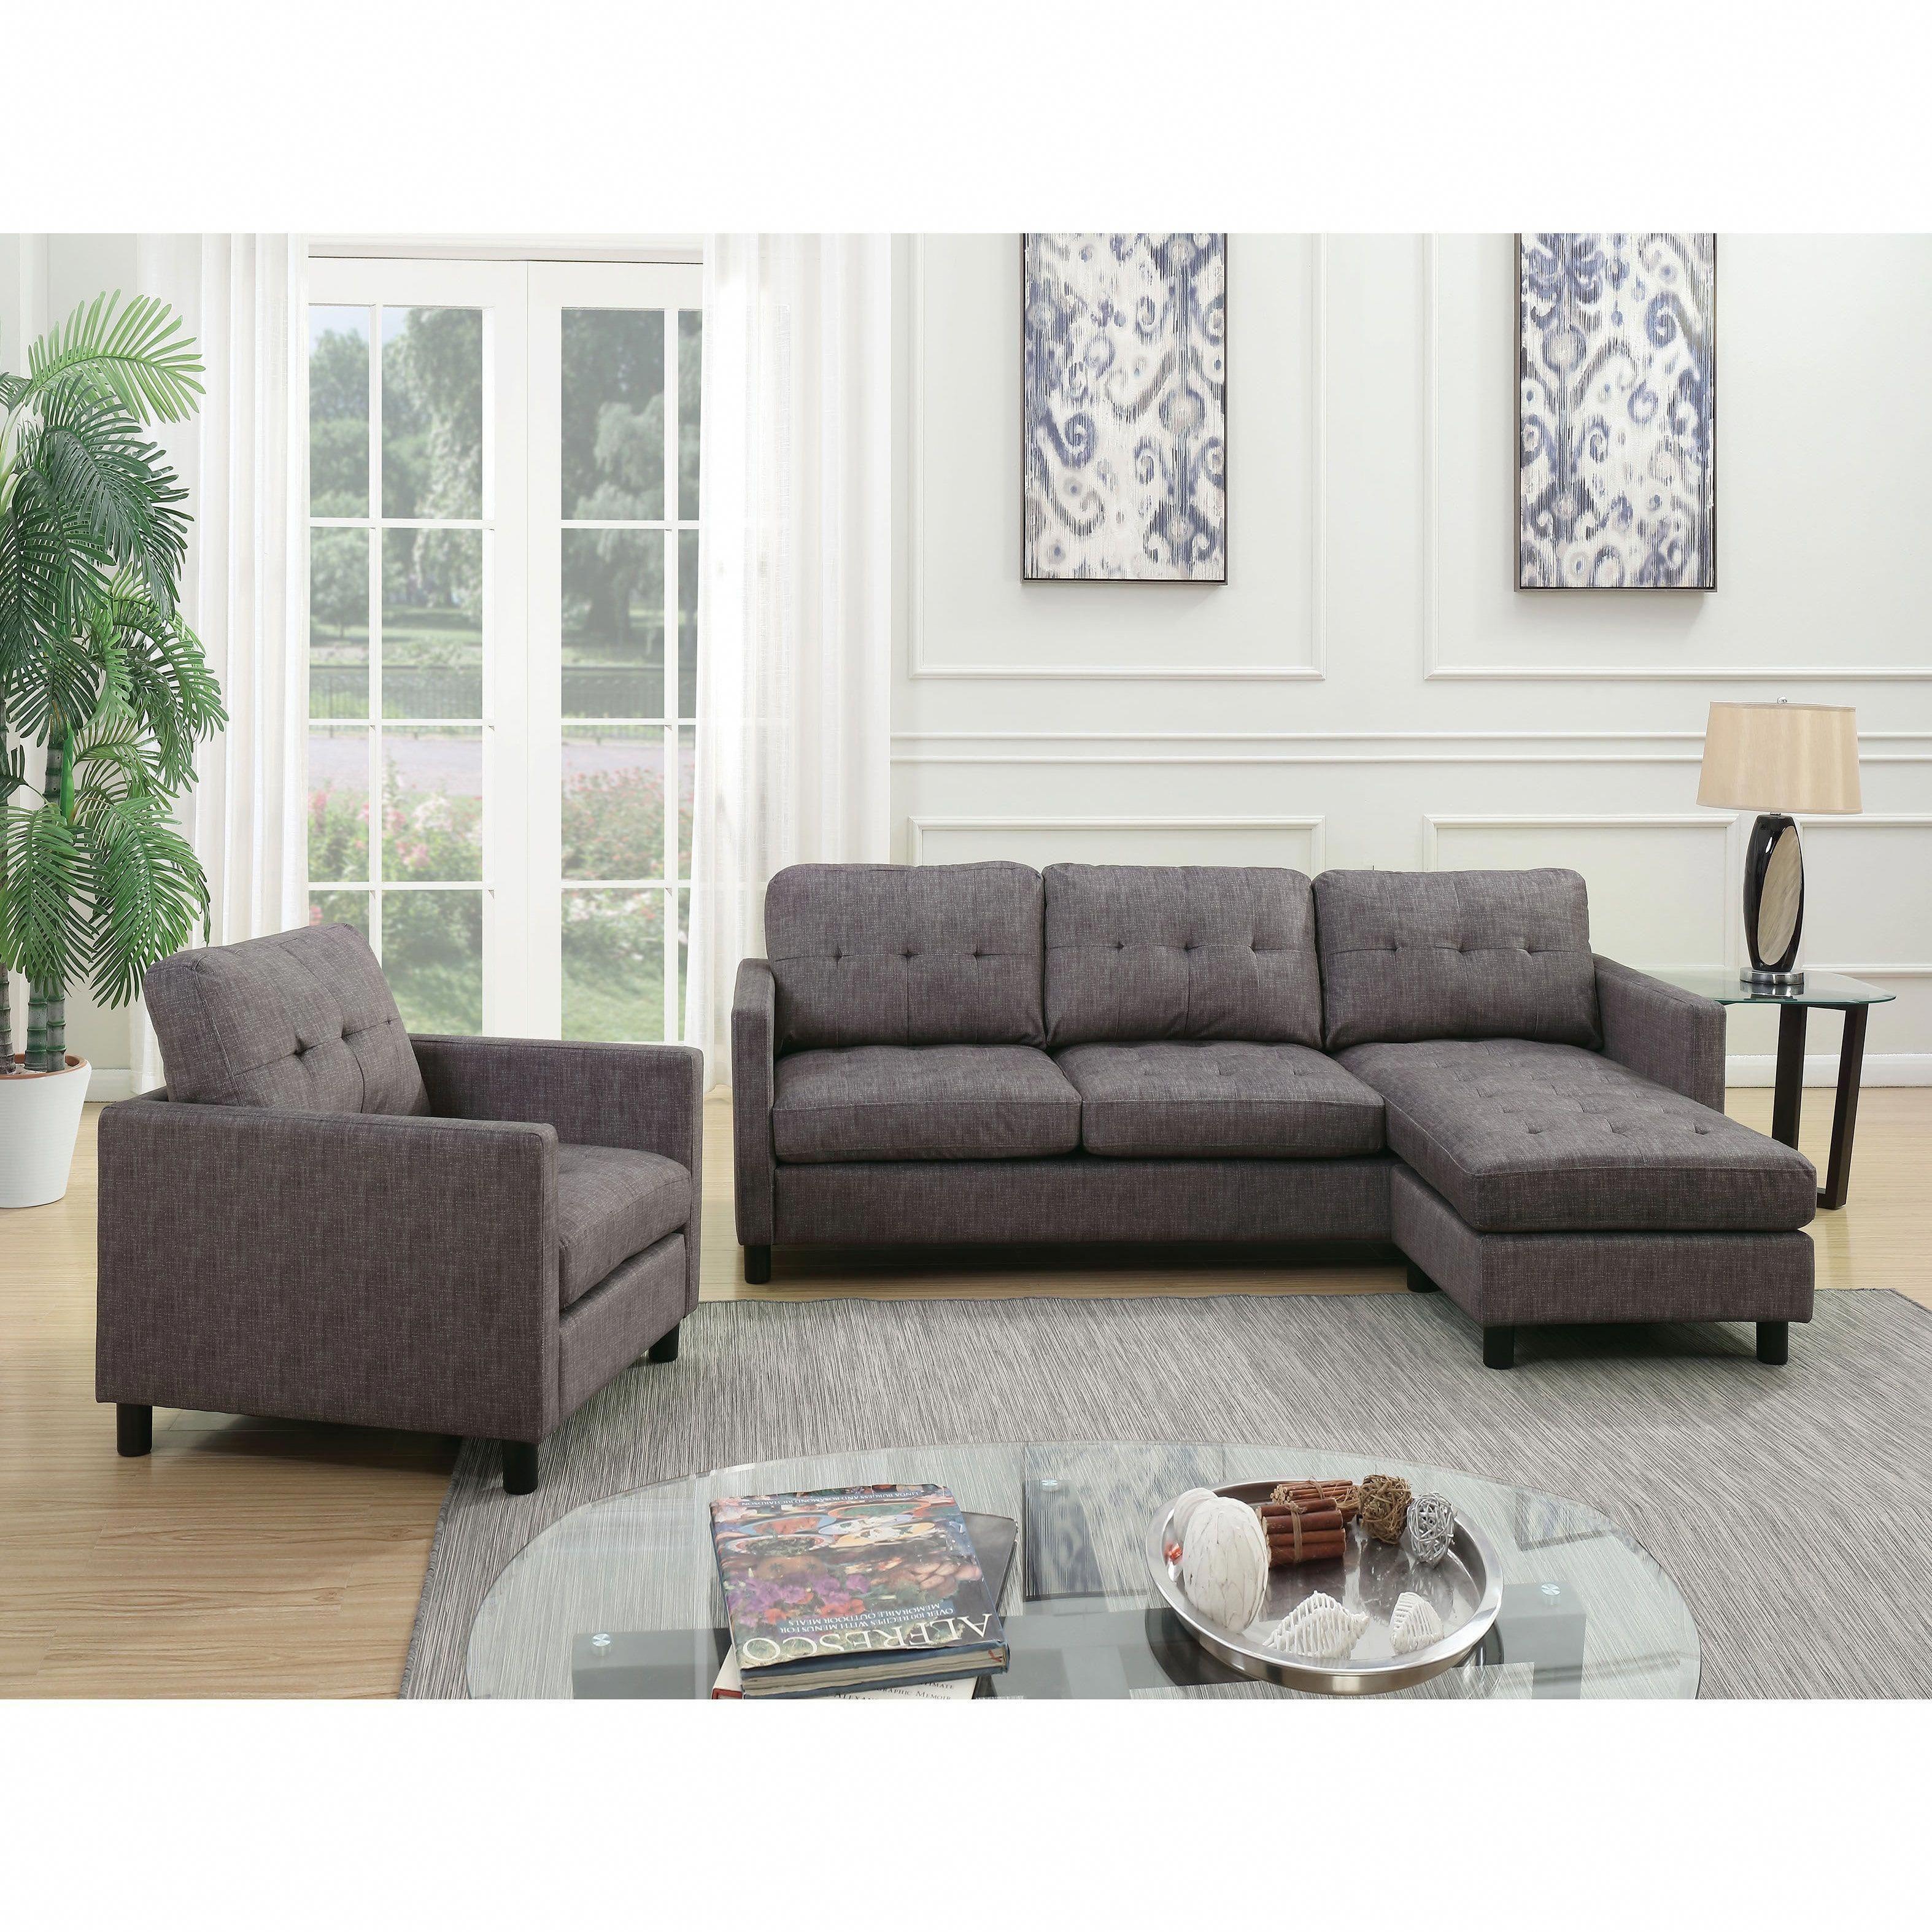 Acme Furniture Ceasar Sectional Sofa Revisable Ottoman Gray